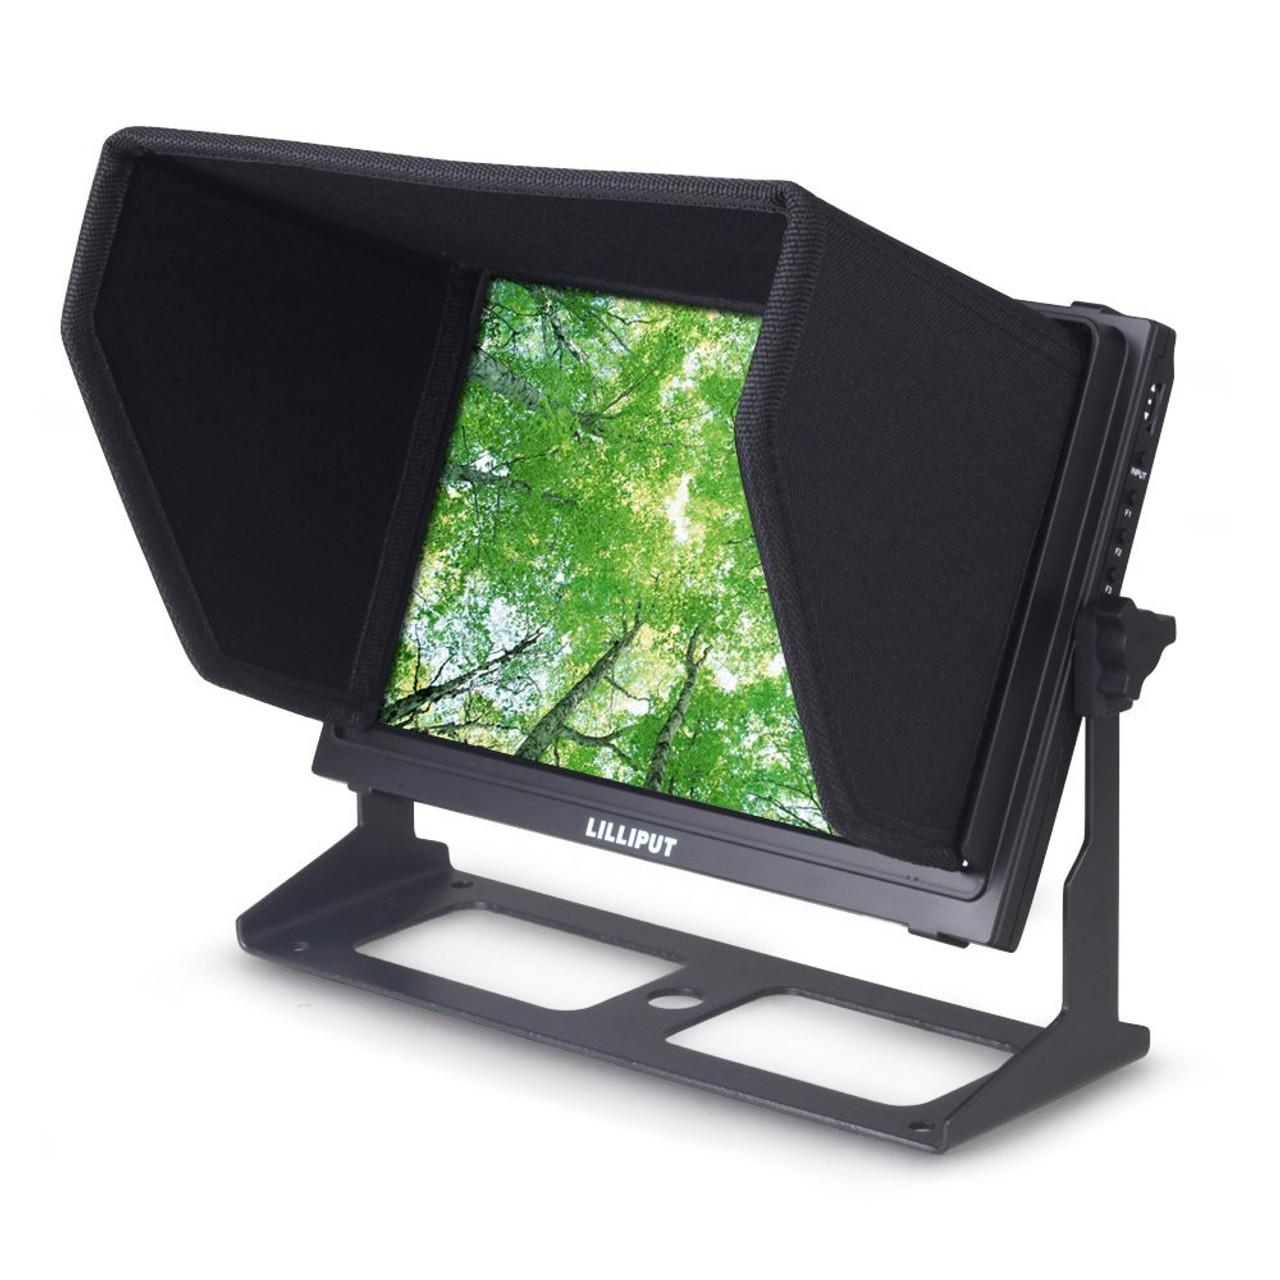 TM-1018/S 10.1 inch Camera top monitor